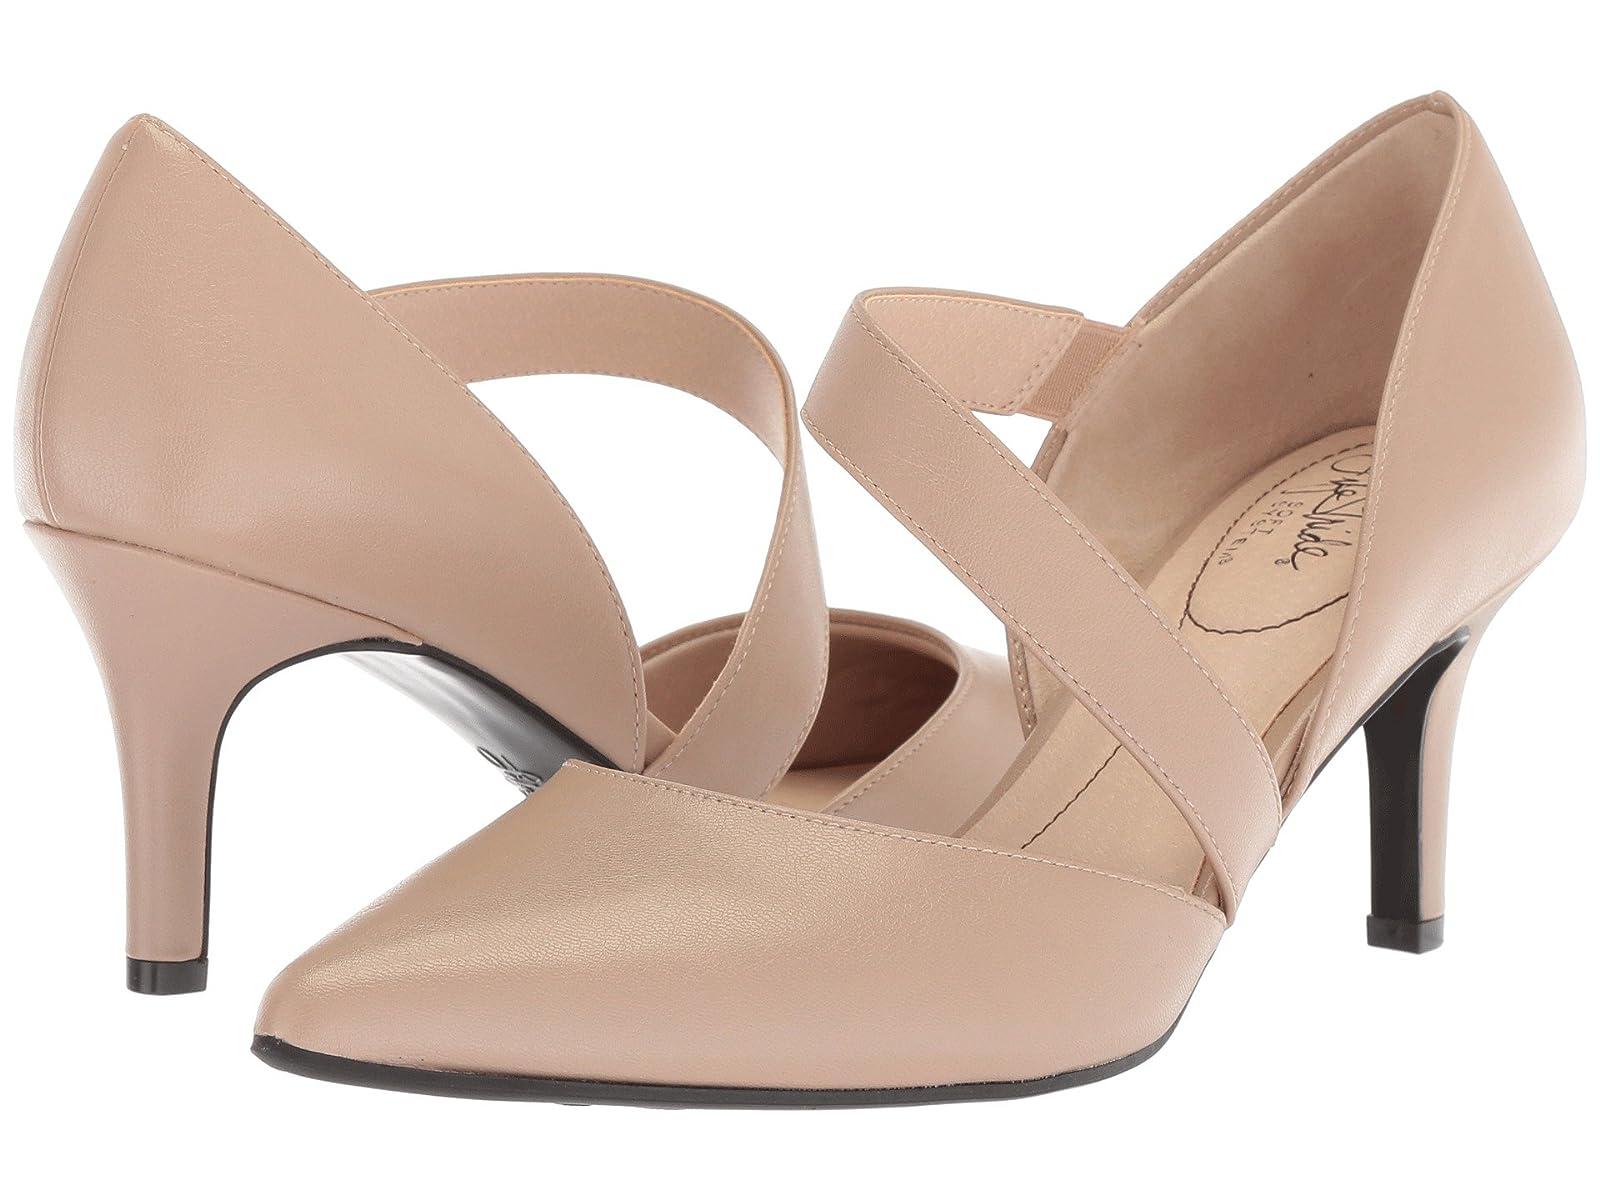 LifeStride SukiAtmospheric grades have affordable shoes